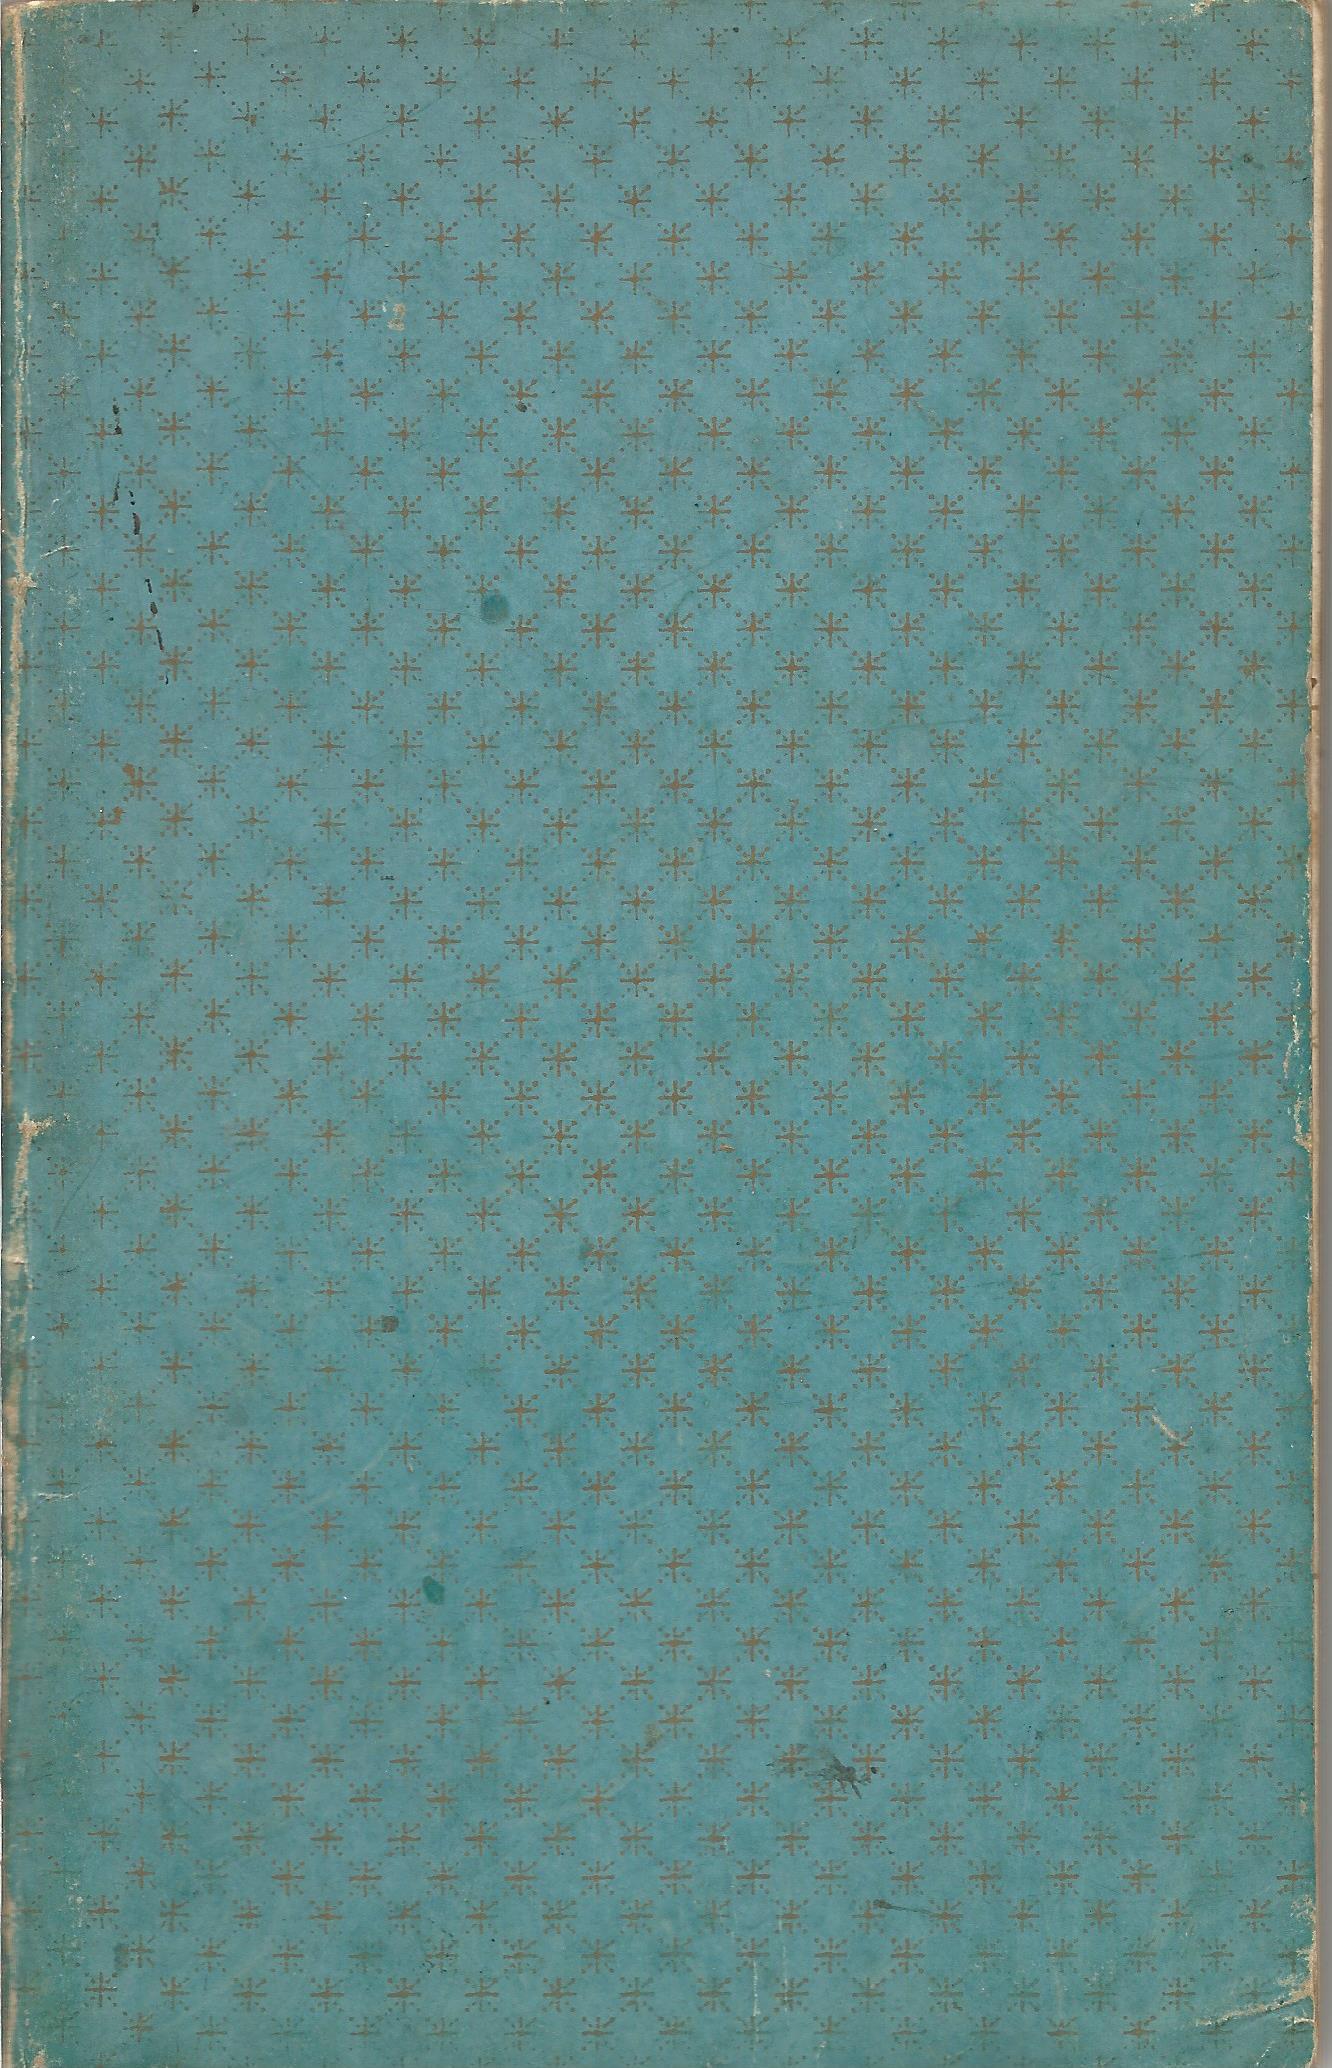 Signed Softback Book of Hand written Poems by Eliza Maria Dalton of 19 Carlton Villas Maida Vale